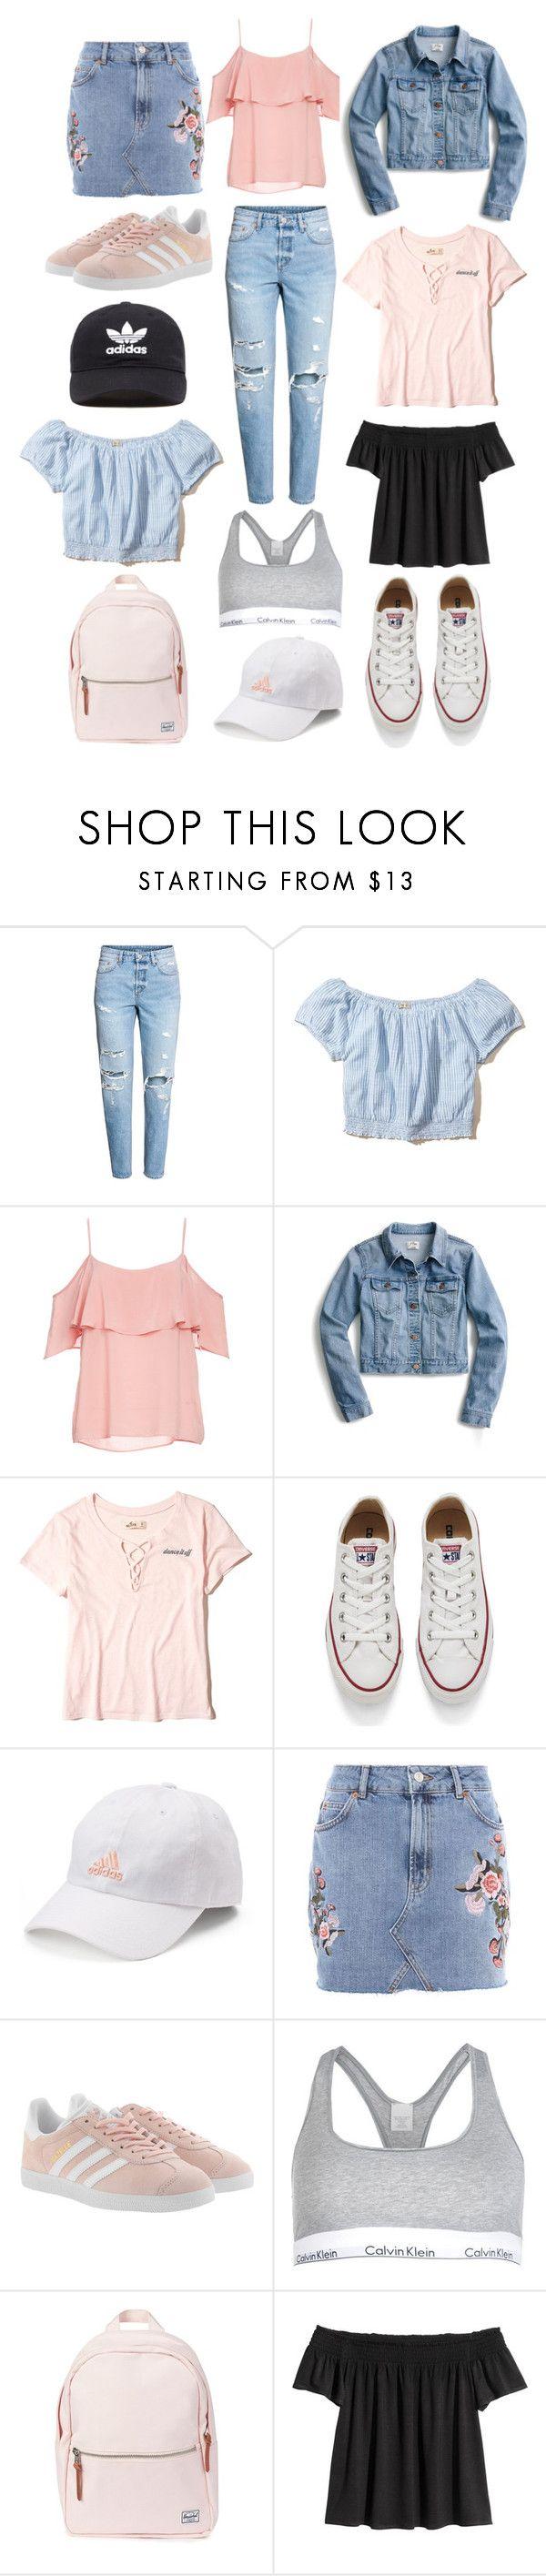 """Spring Trends For Teens"" by taiyamaddisonblog on Polyvore featuring Hollister Co., BB Dakota, J.Crew, Converse, adidas, Topshop, adidas Originals, Calvin Klein and Herschel"